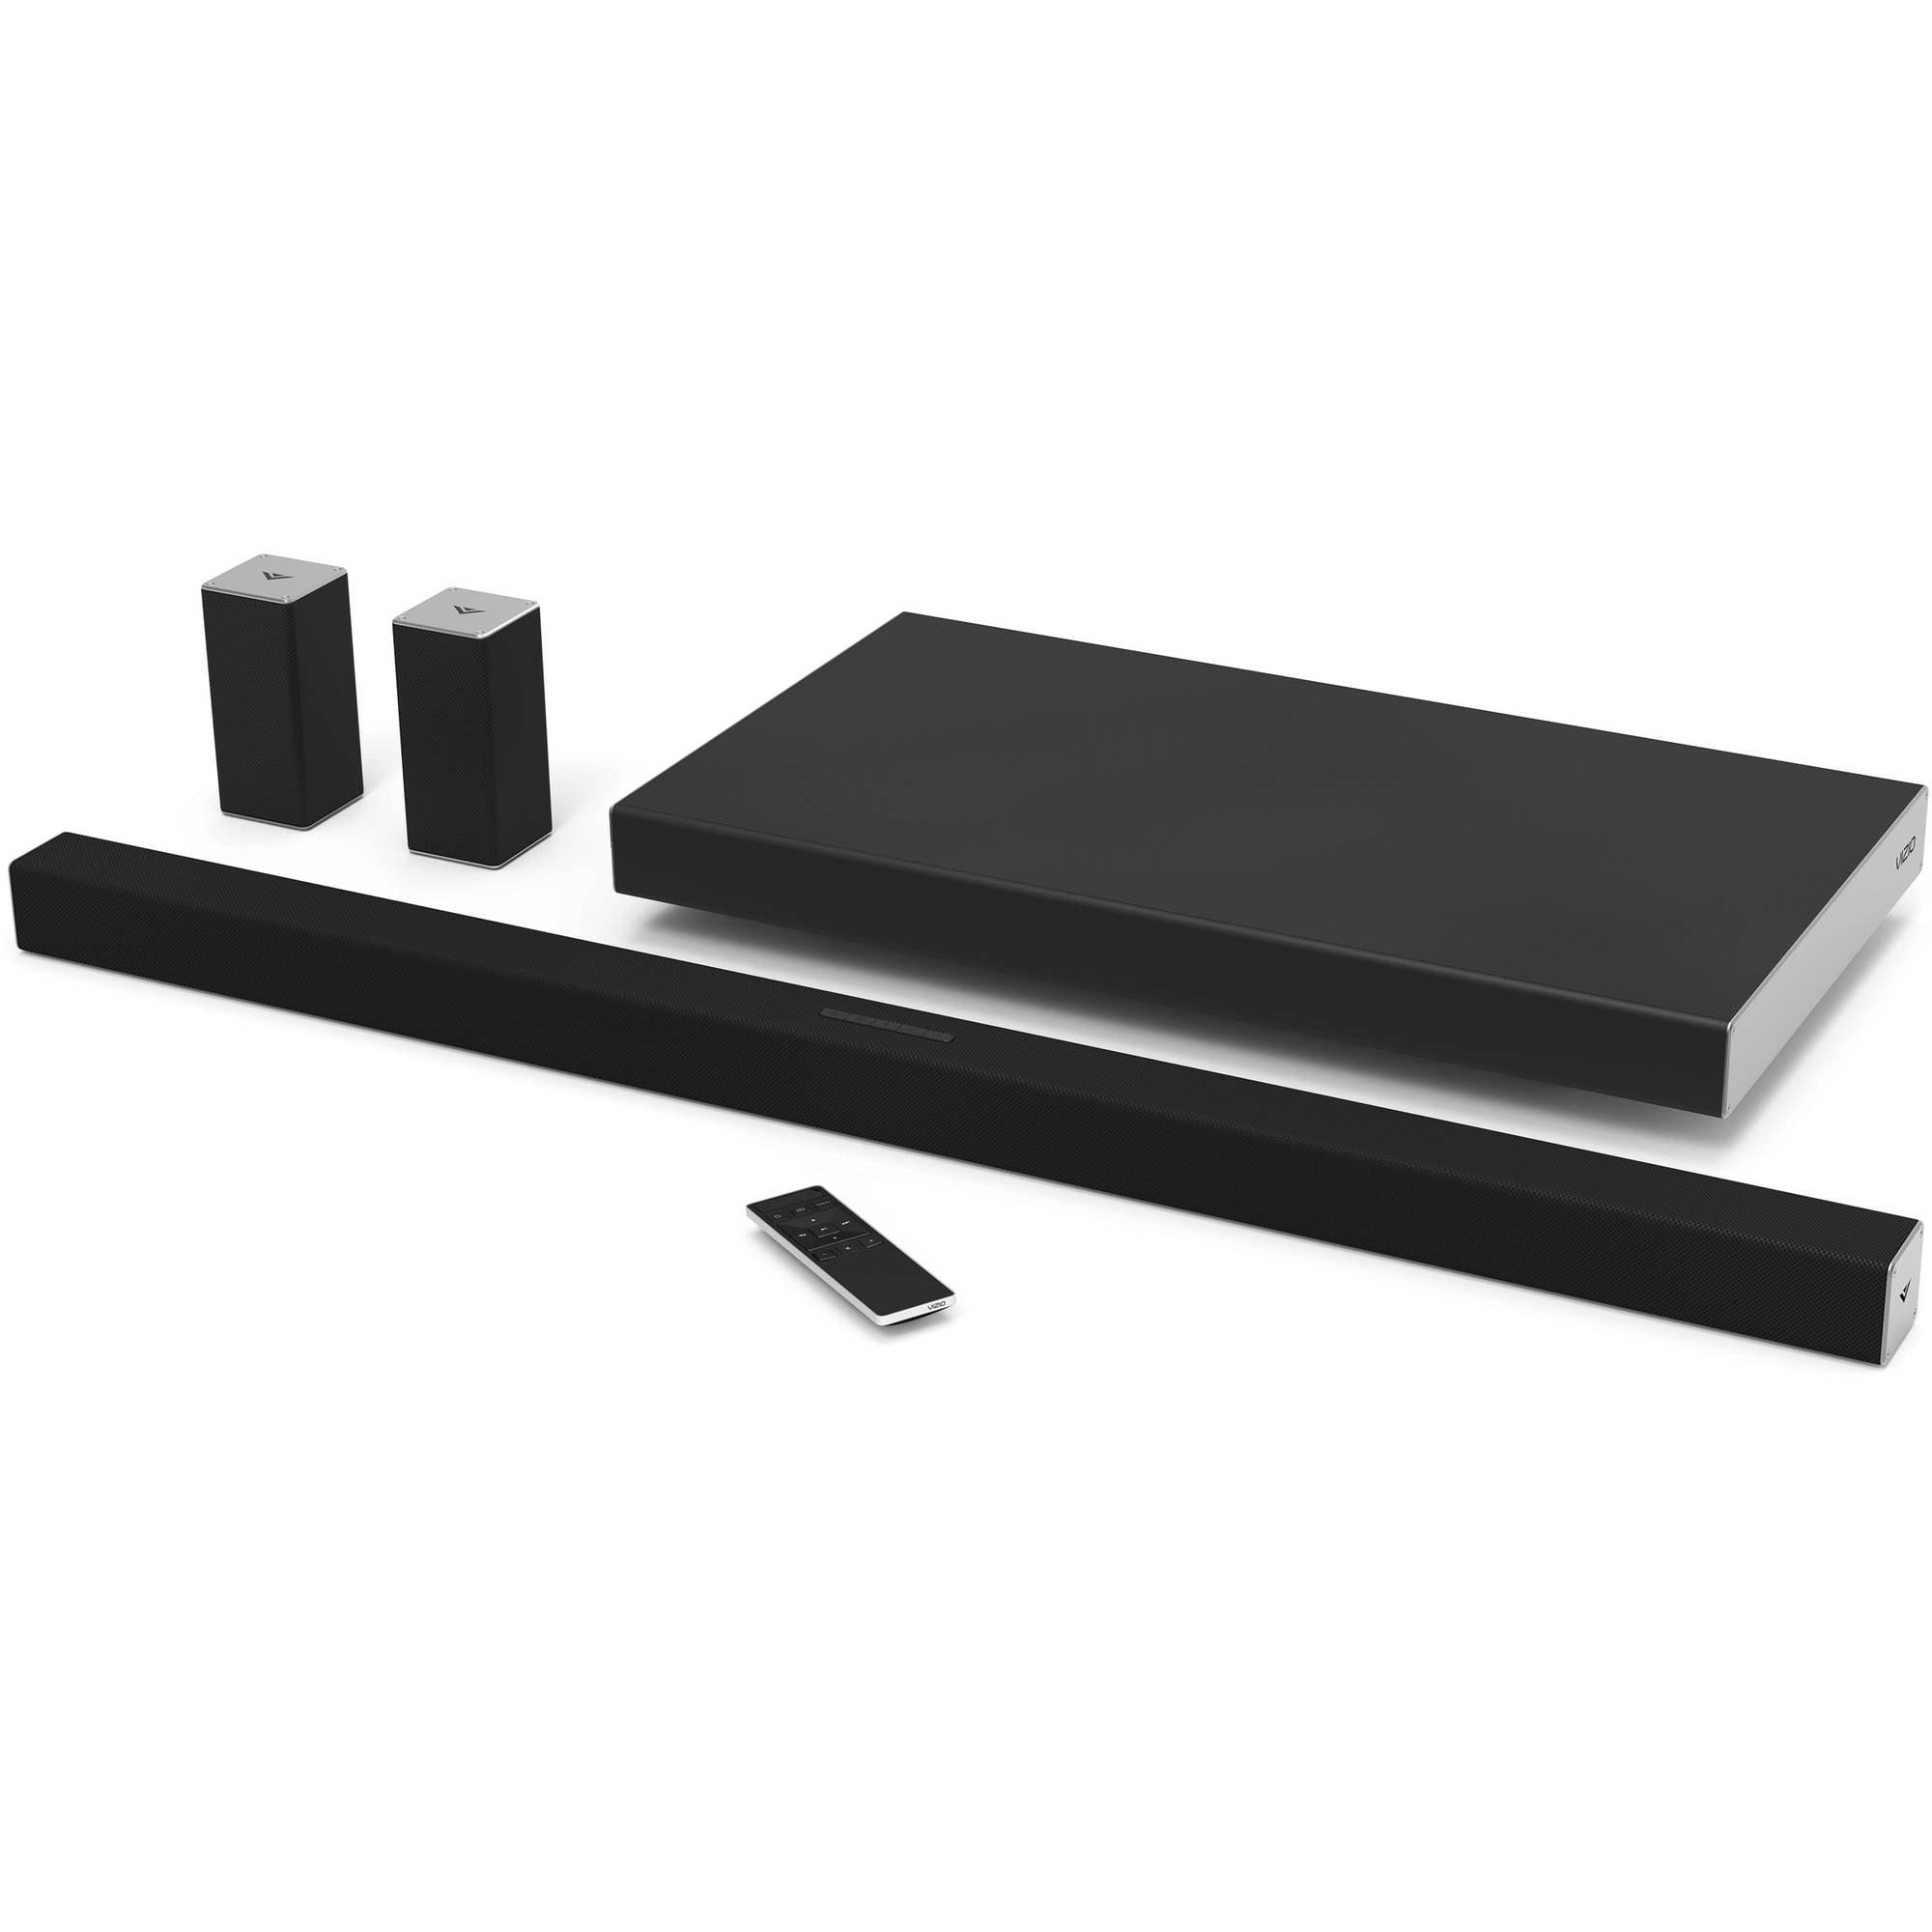 "VIZIO 40"" 5.1ch Sound Bar System SmartCast (SB4051-D5)"